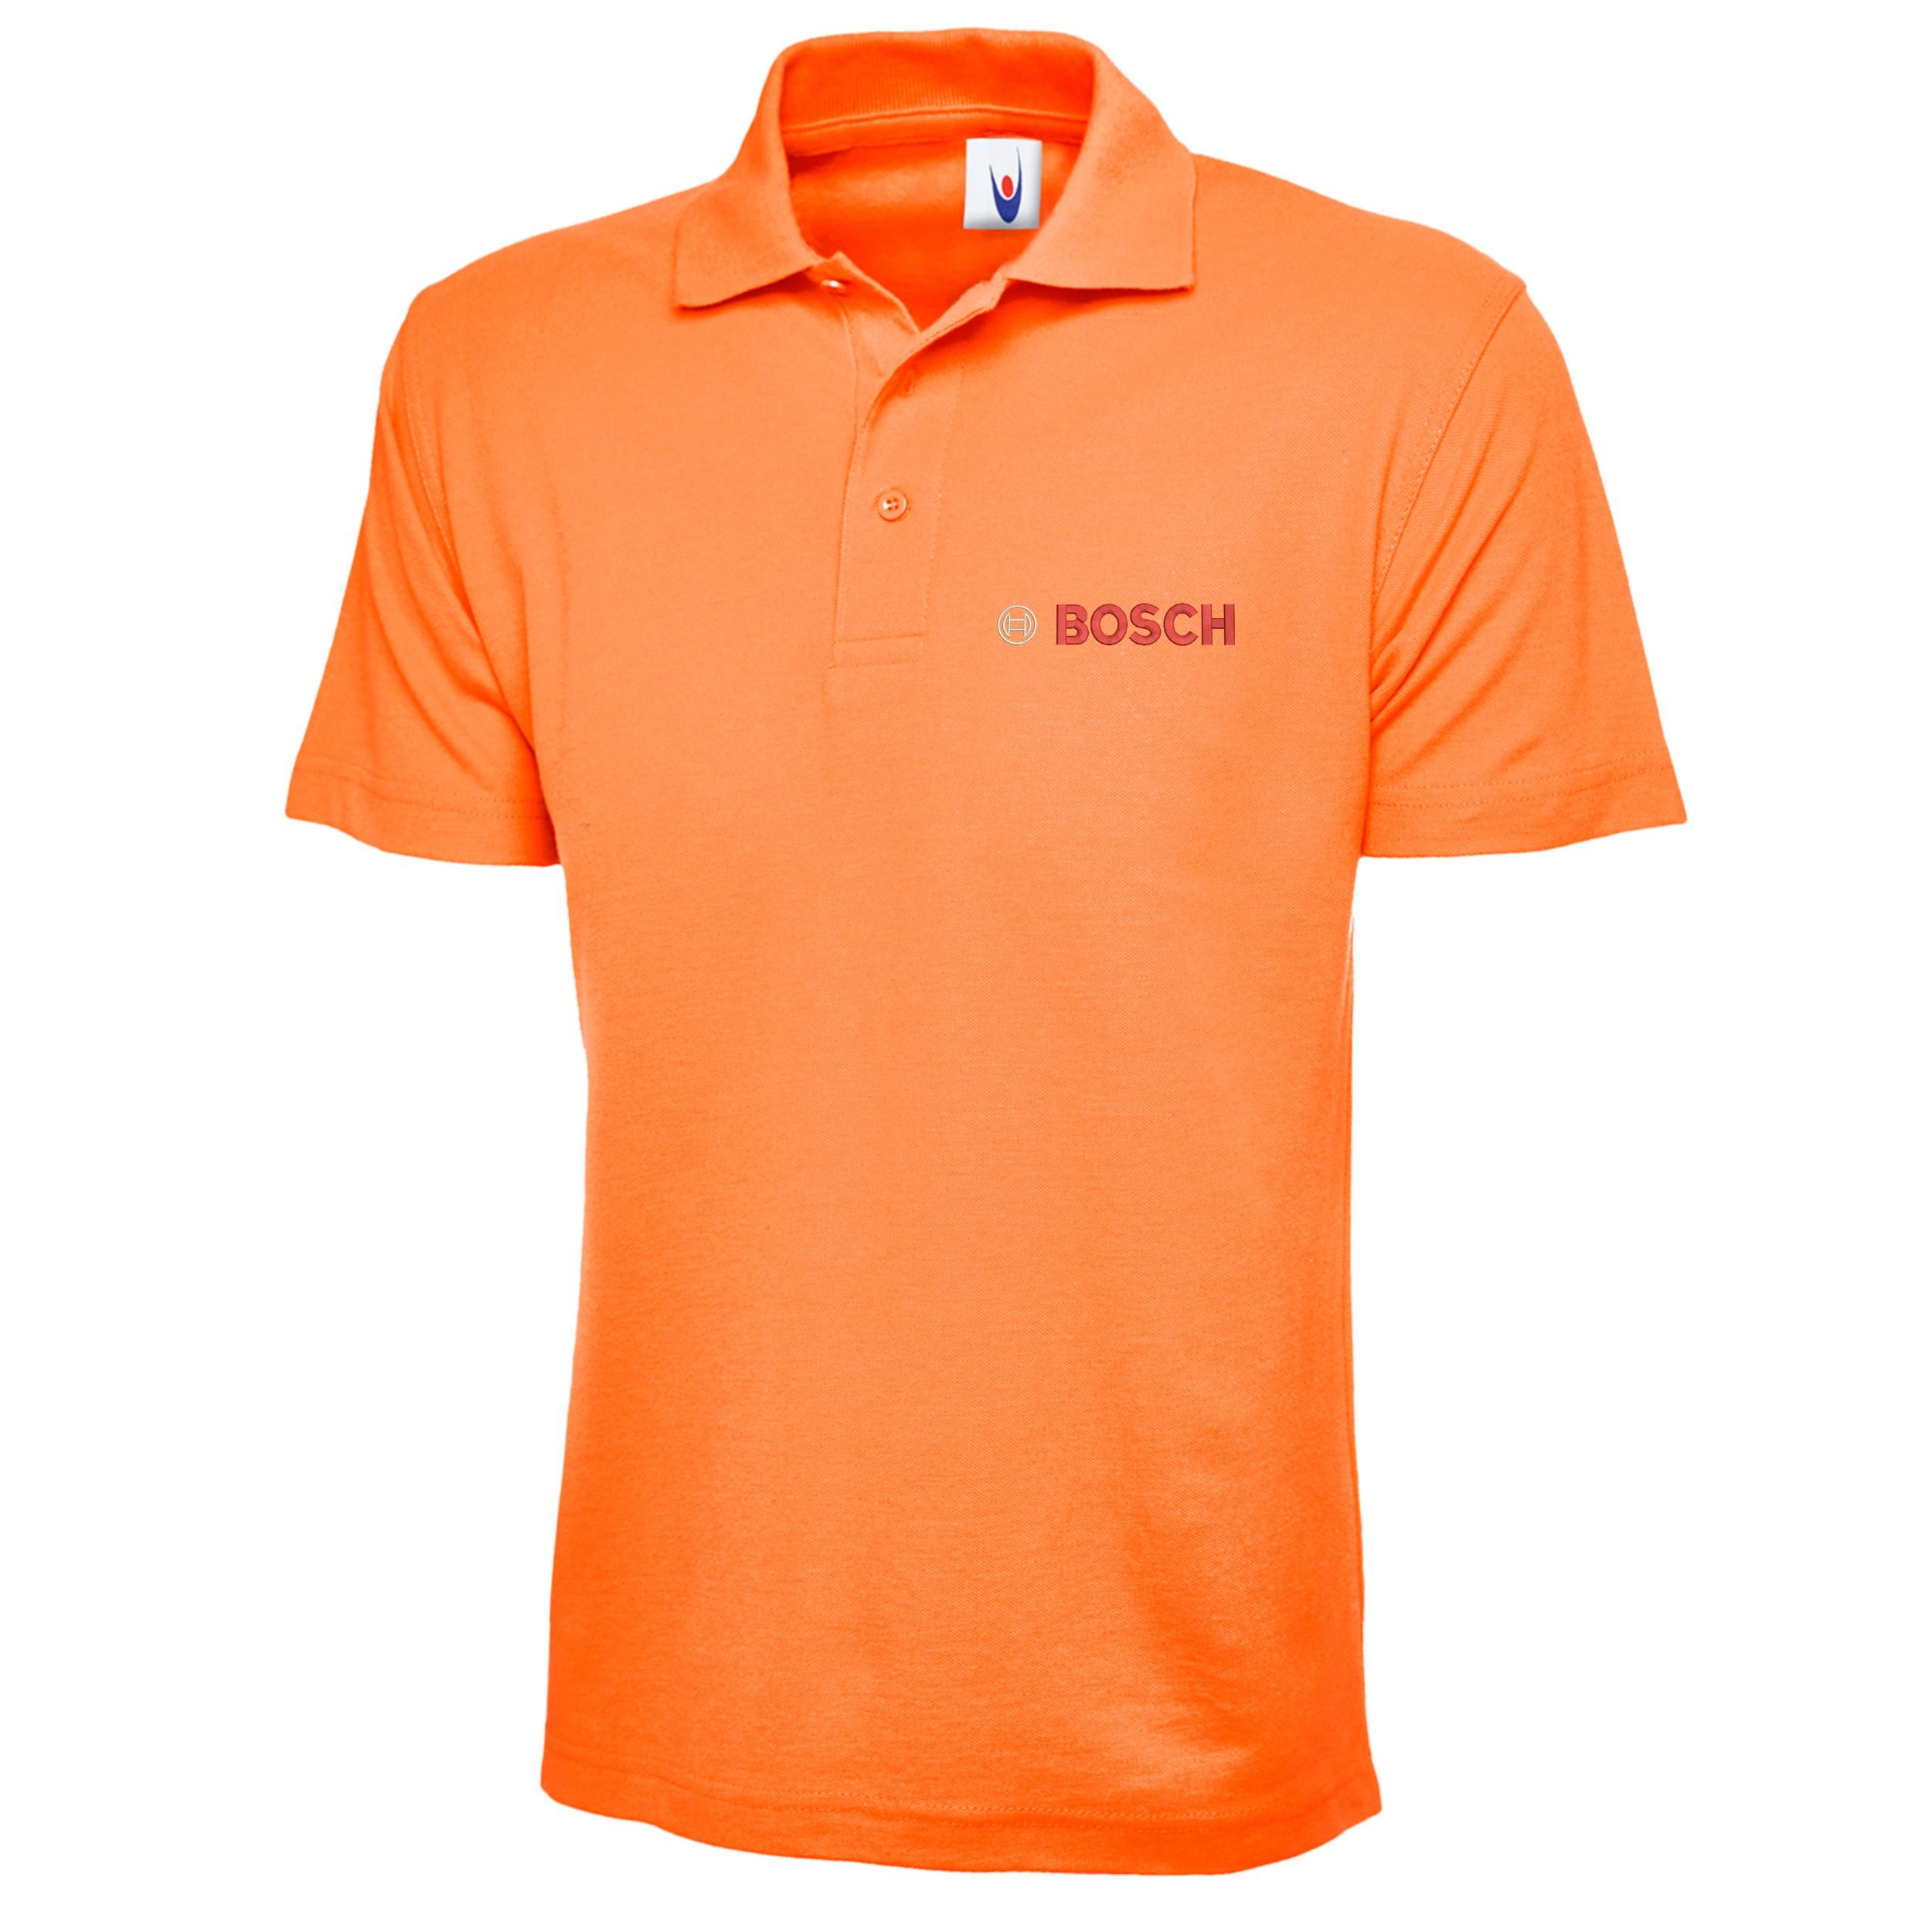 Embroidered Bosch Logo Polo Shirt, Workwear Uniform ...